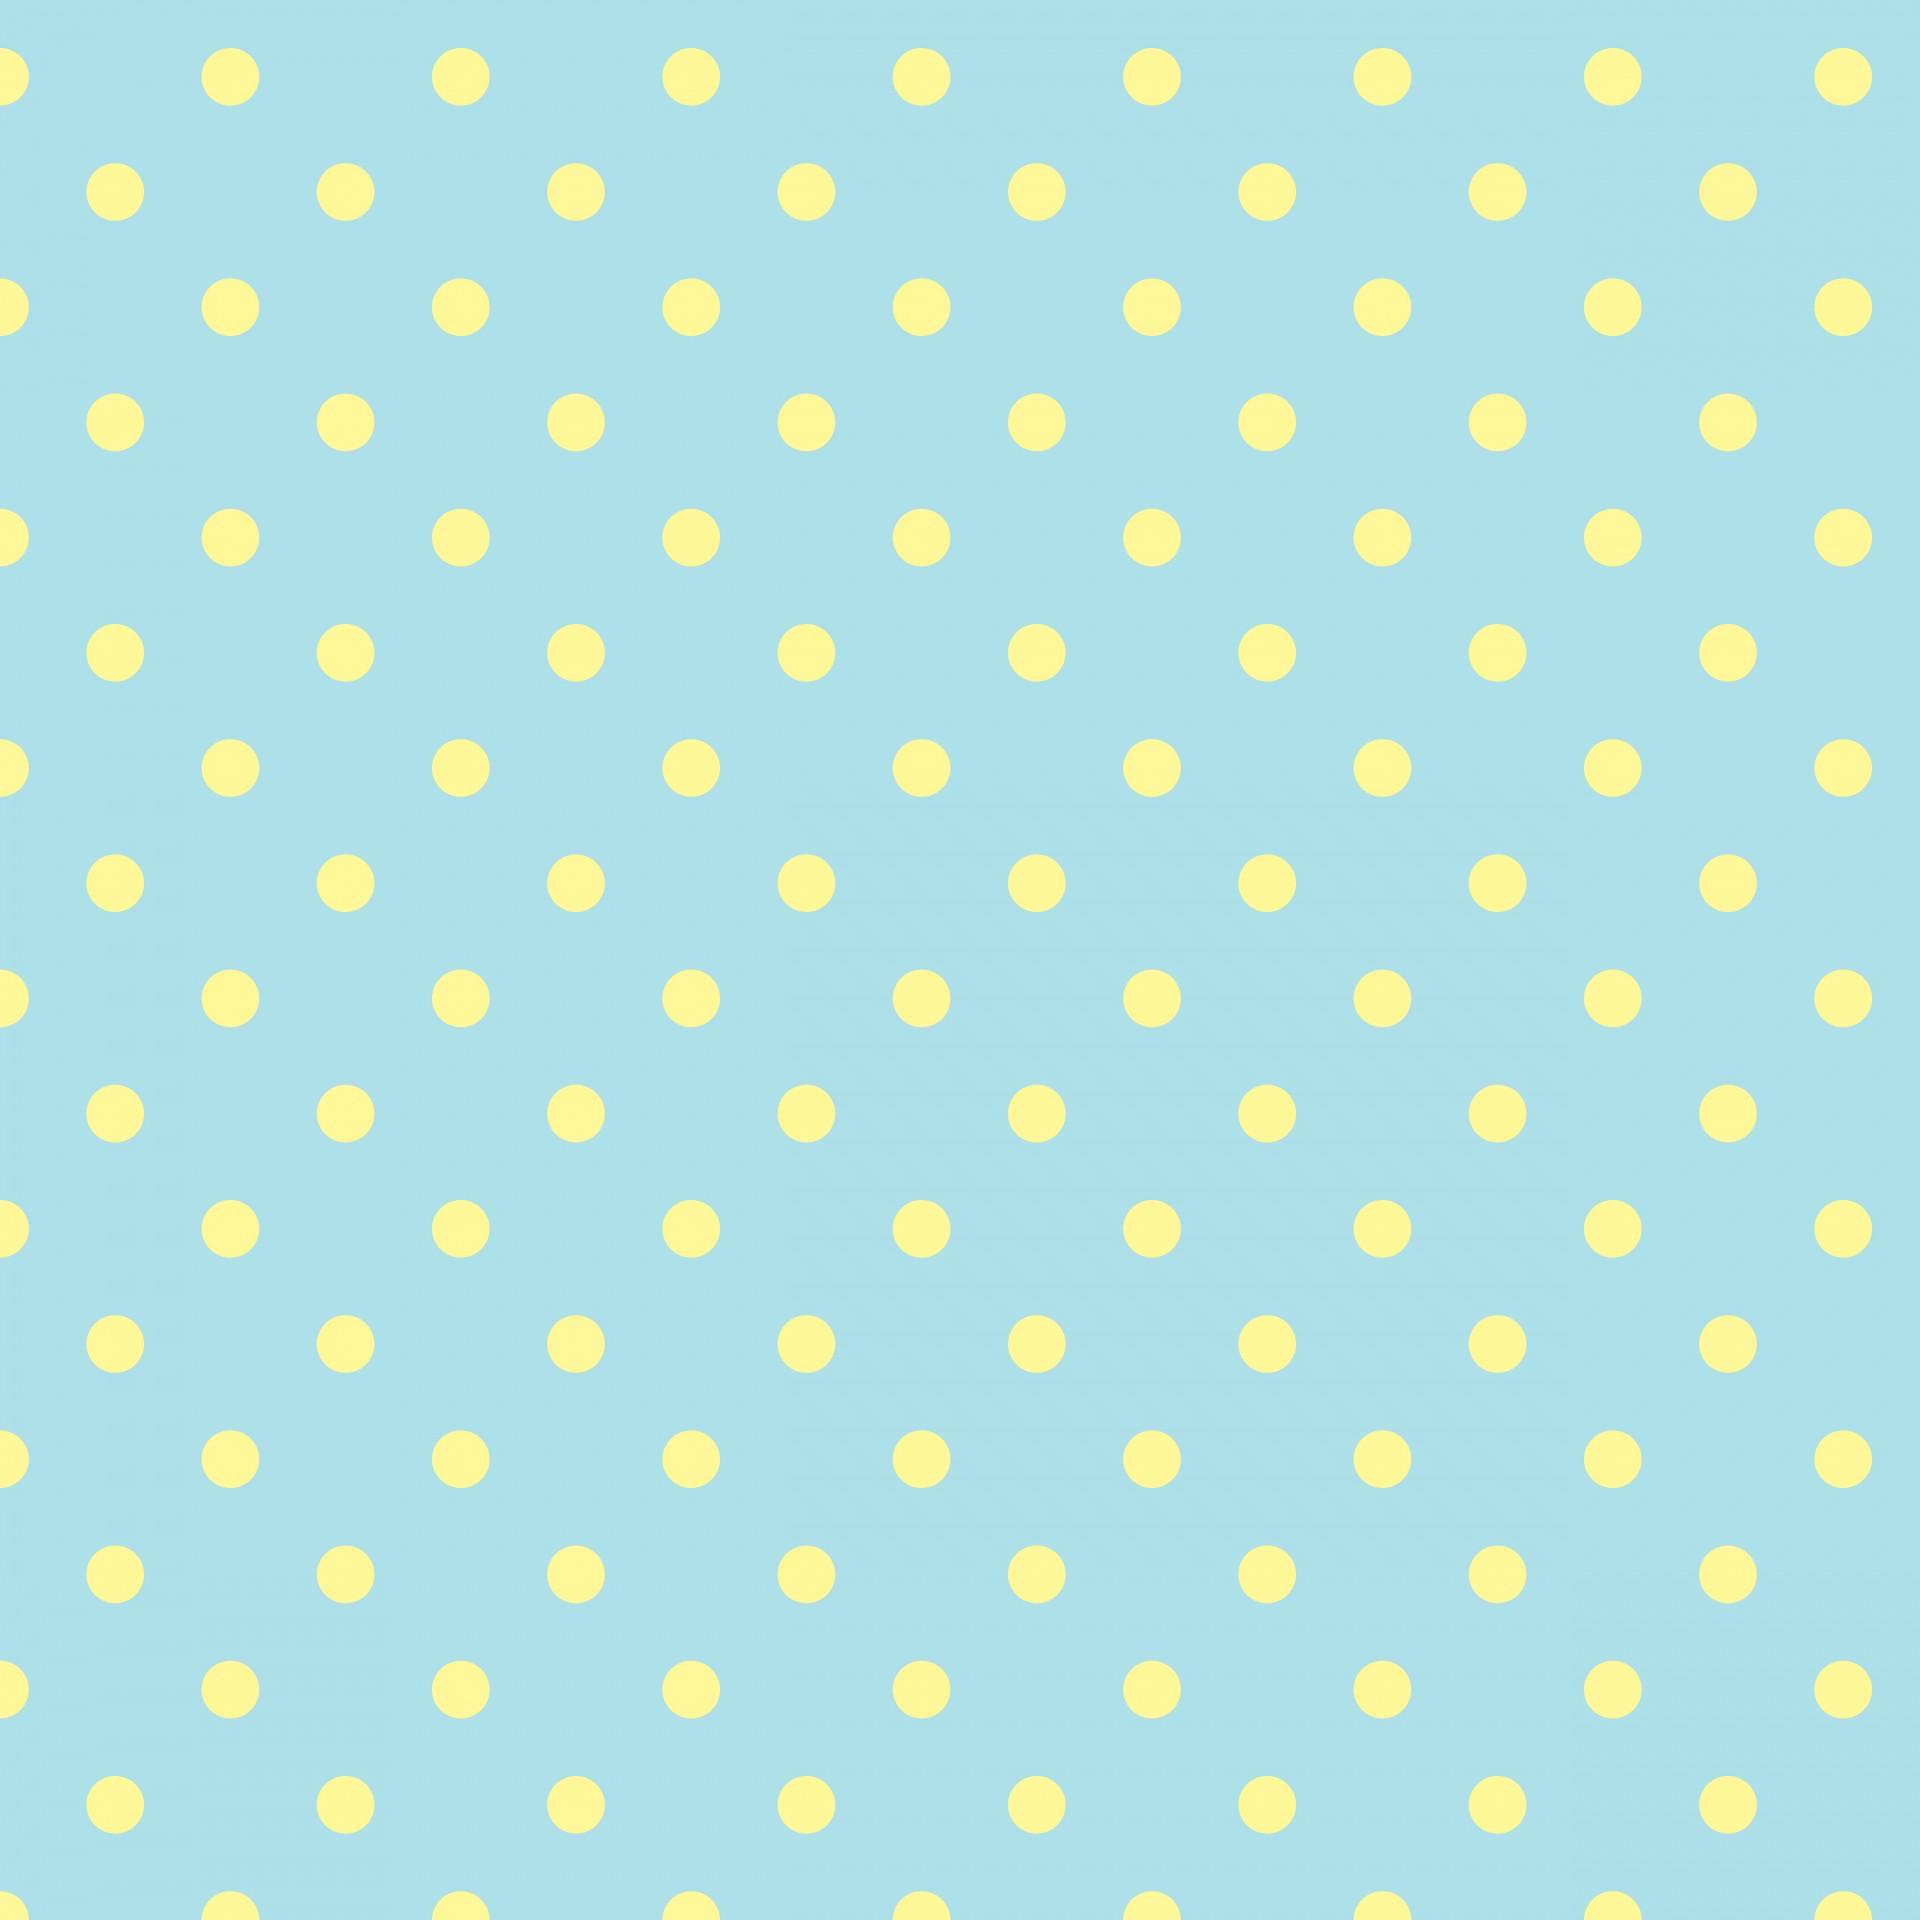 Blue yellow paper photo